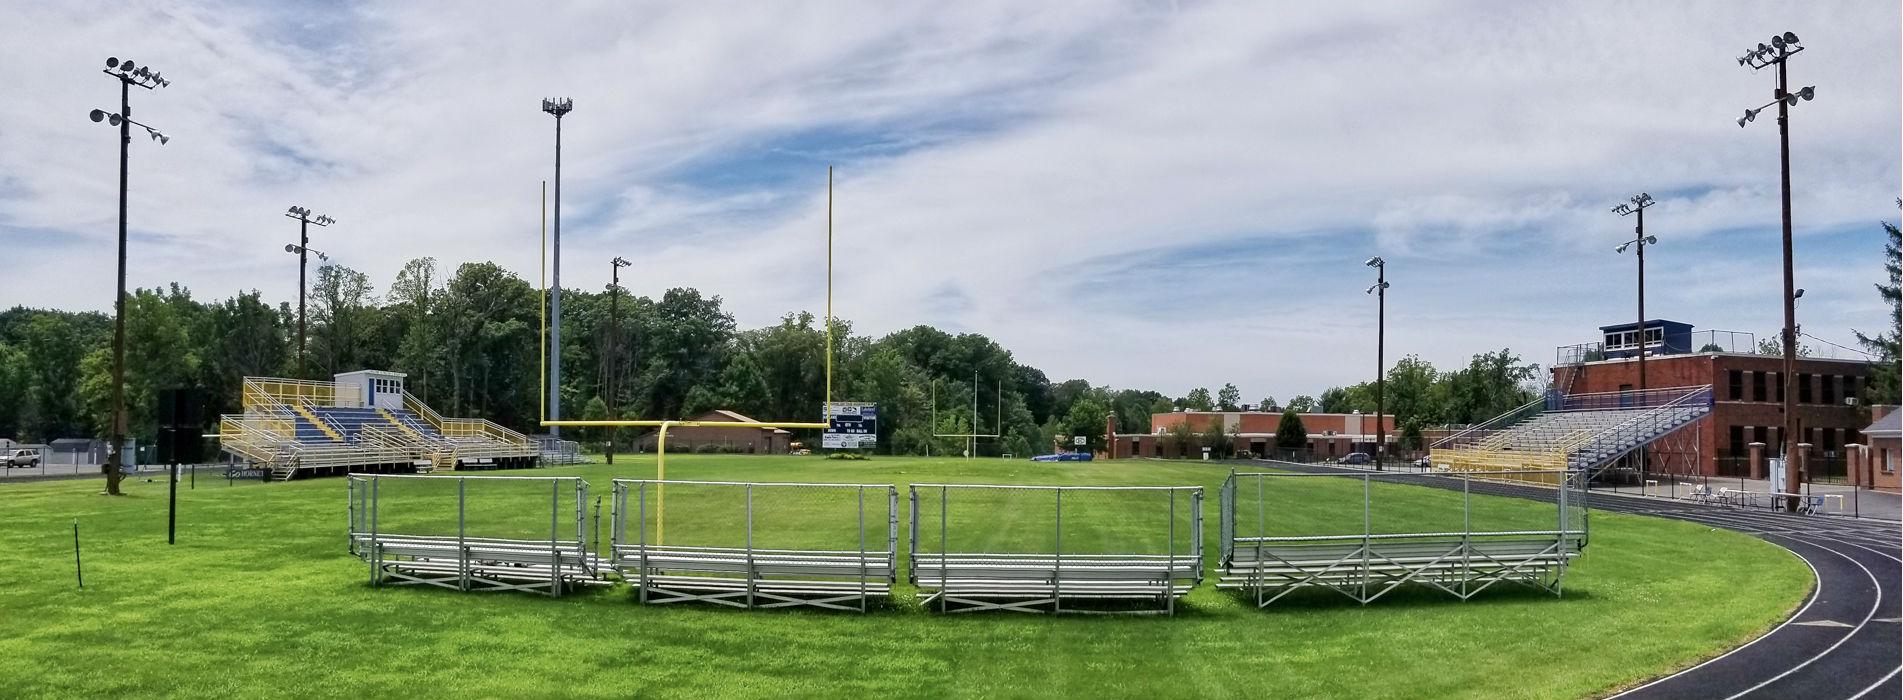 City of Kirtland Ohio Football Field